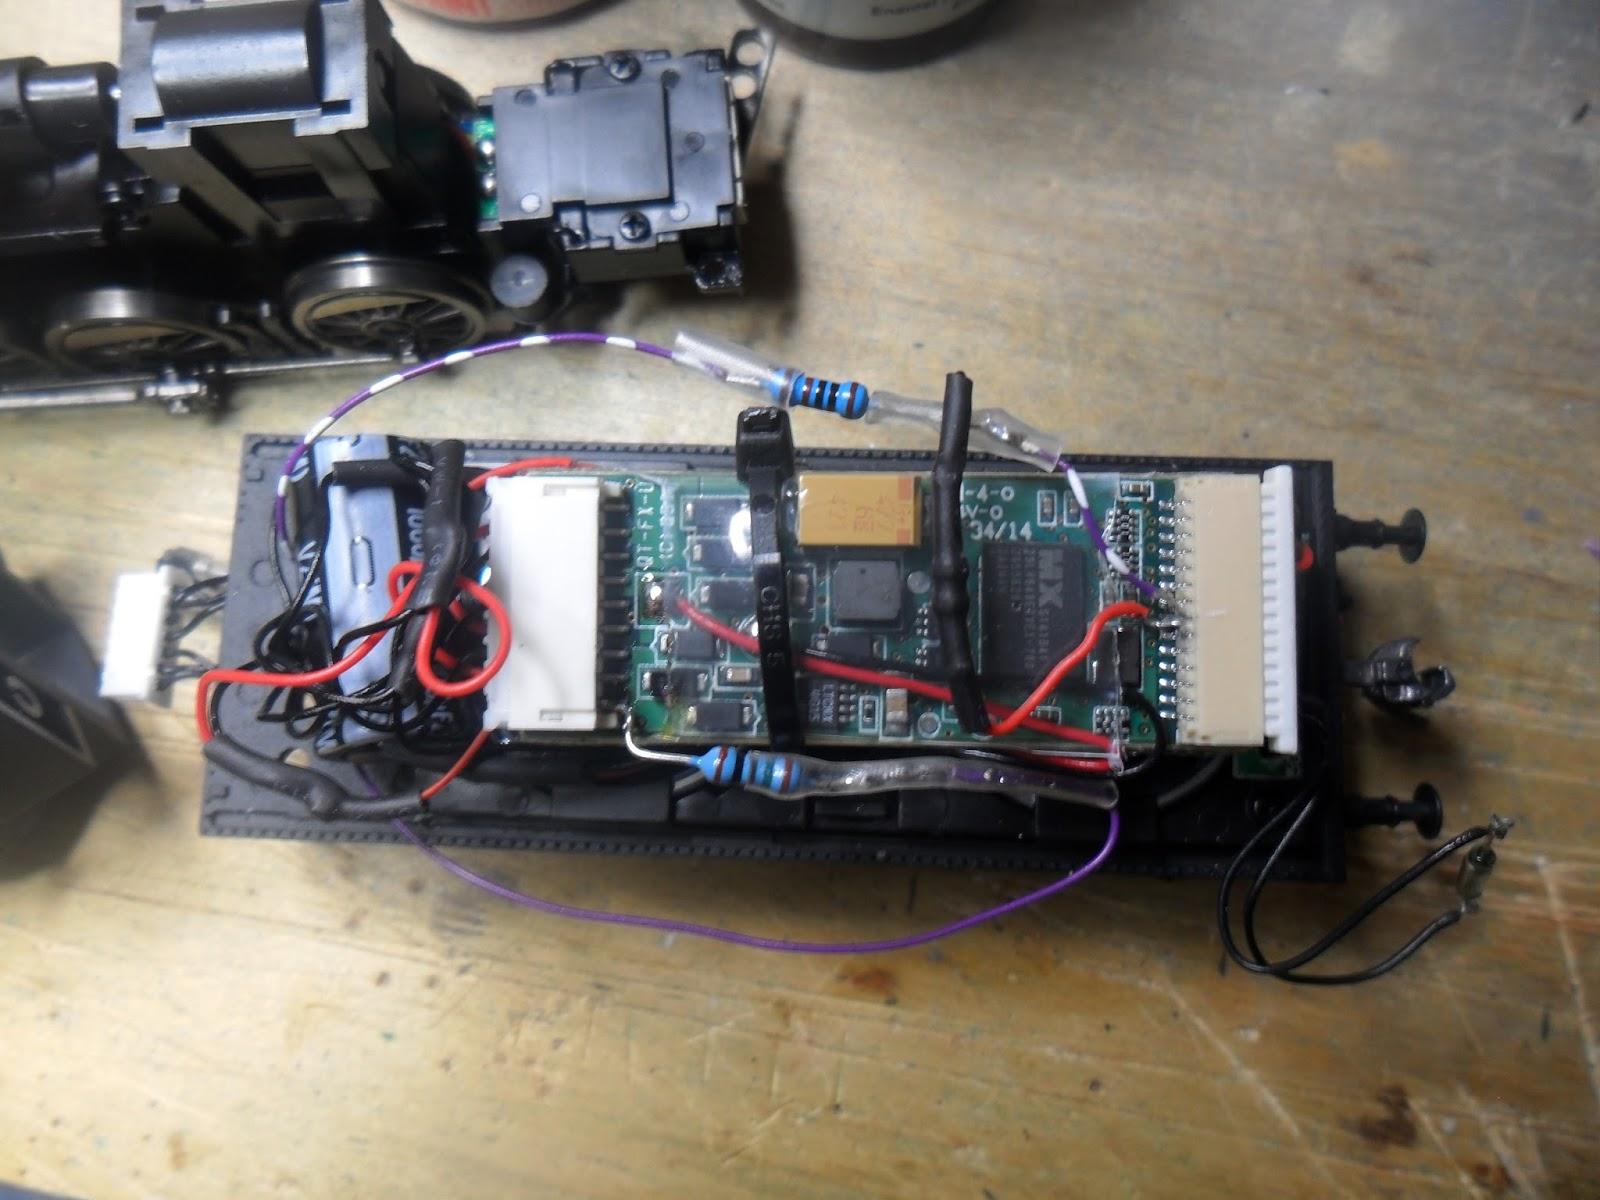 Bylong Adjusting The Lighting On A Eureka Models D50 Class Bit Shed Wiringjpg Extra Titan Decoder Wiring For Lights